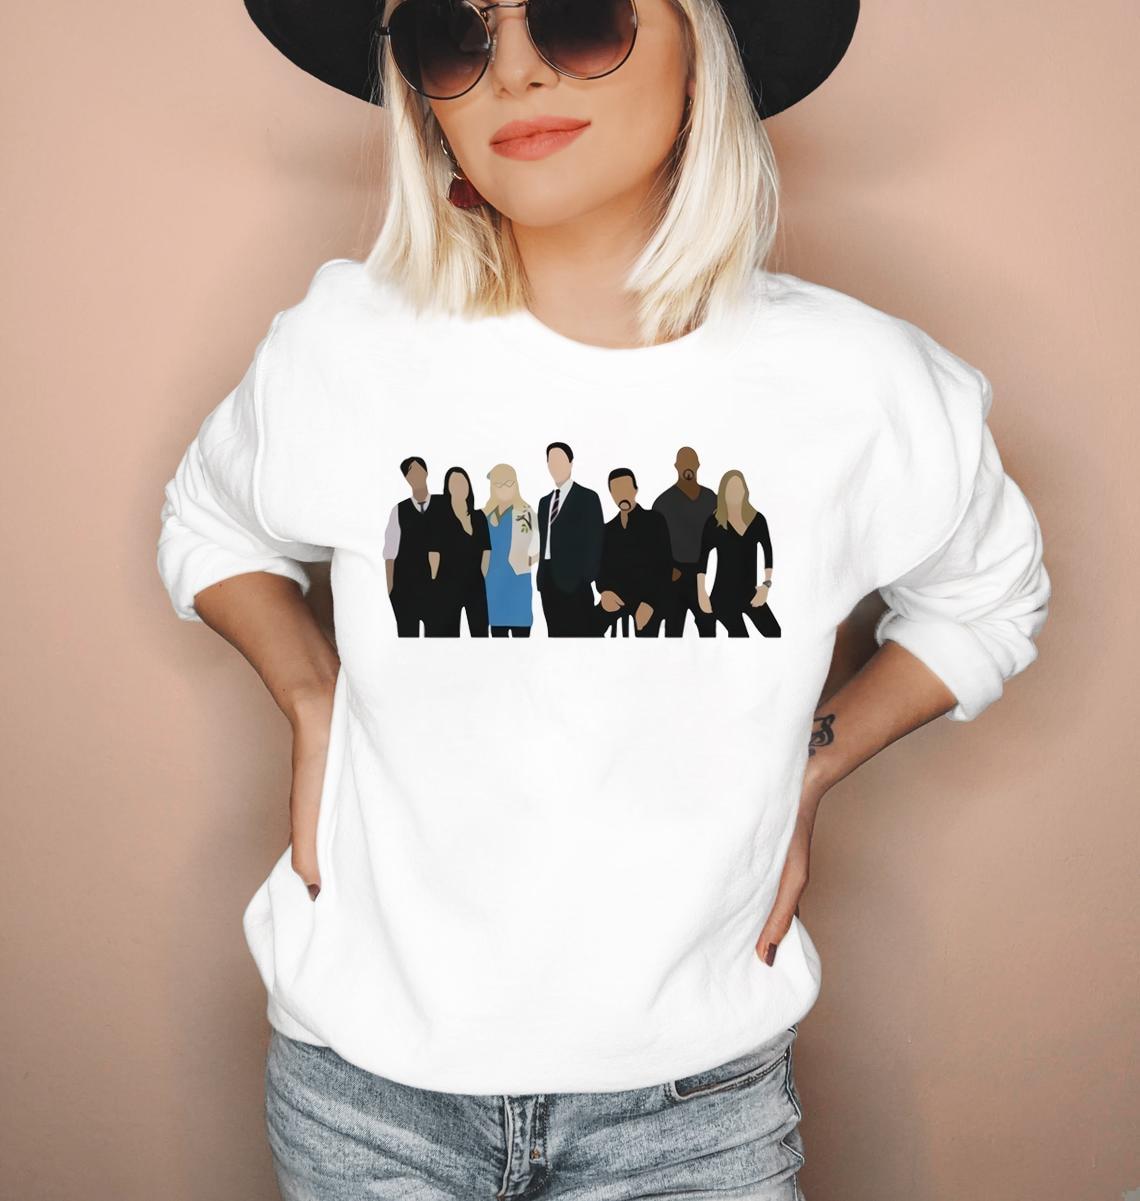 2020 Criminal Minds Faceless Unisex Heavy Blend Crewneck Sweatshirt Funny Criminal Minds Inspired Pullover Jumpers Hoodies Sweatshirts Aliexpress [ 1201 x 1140 Pixel ]